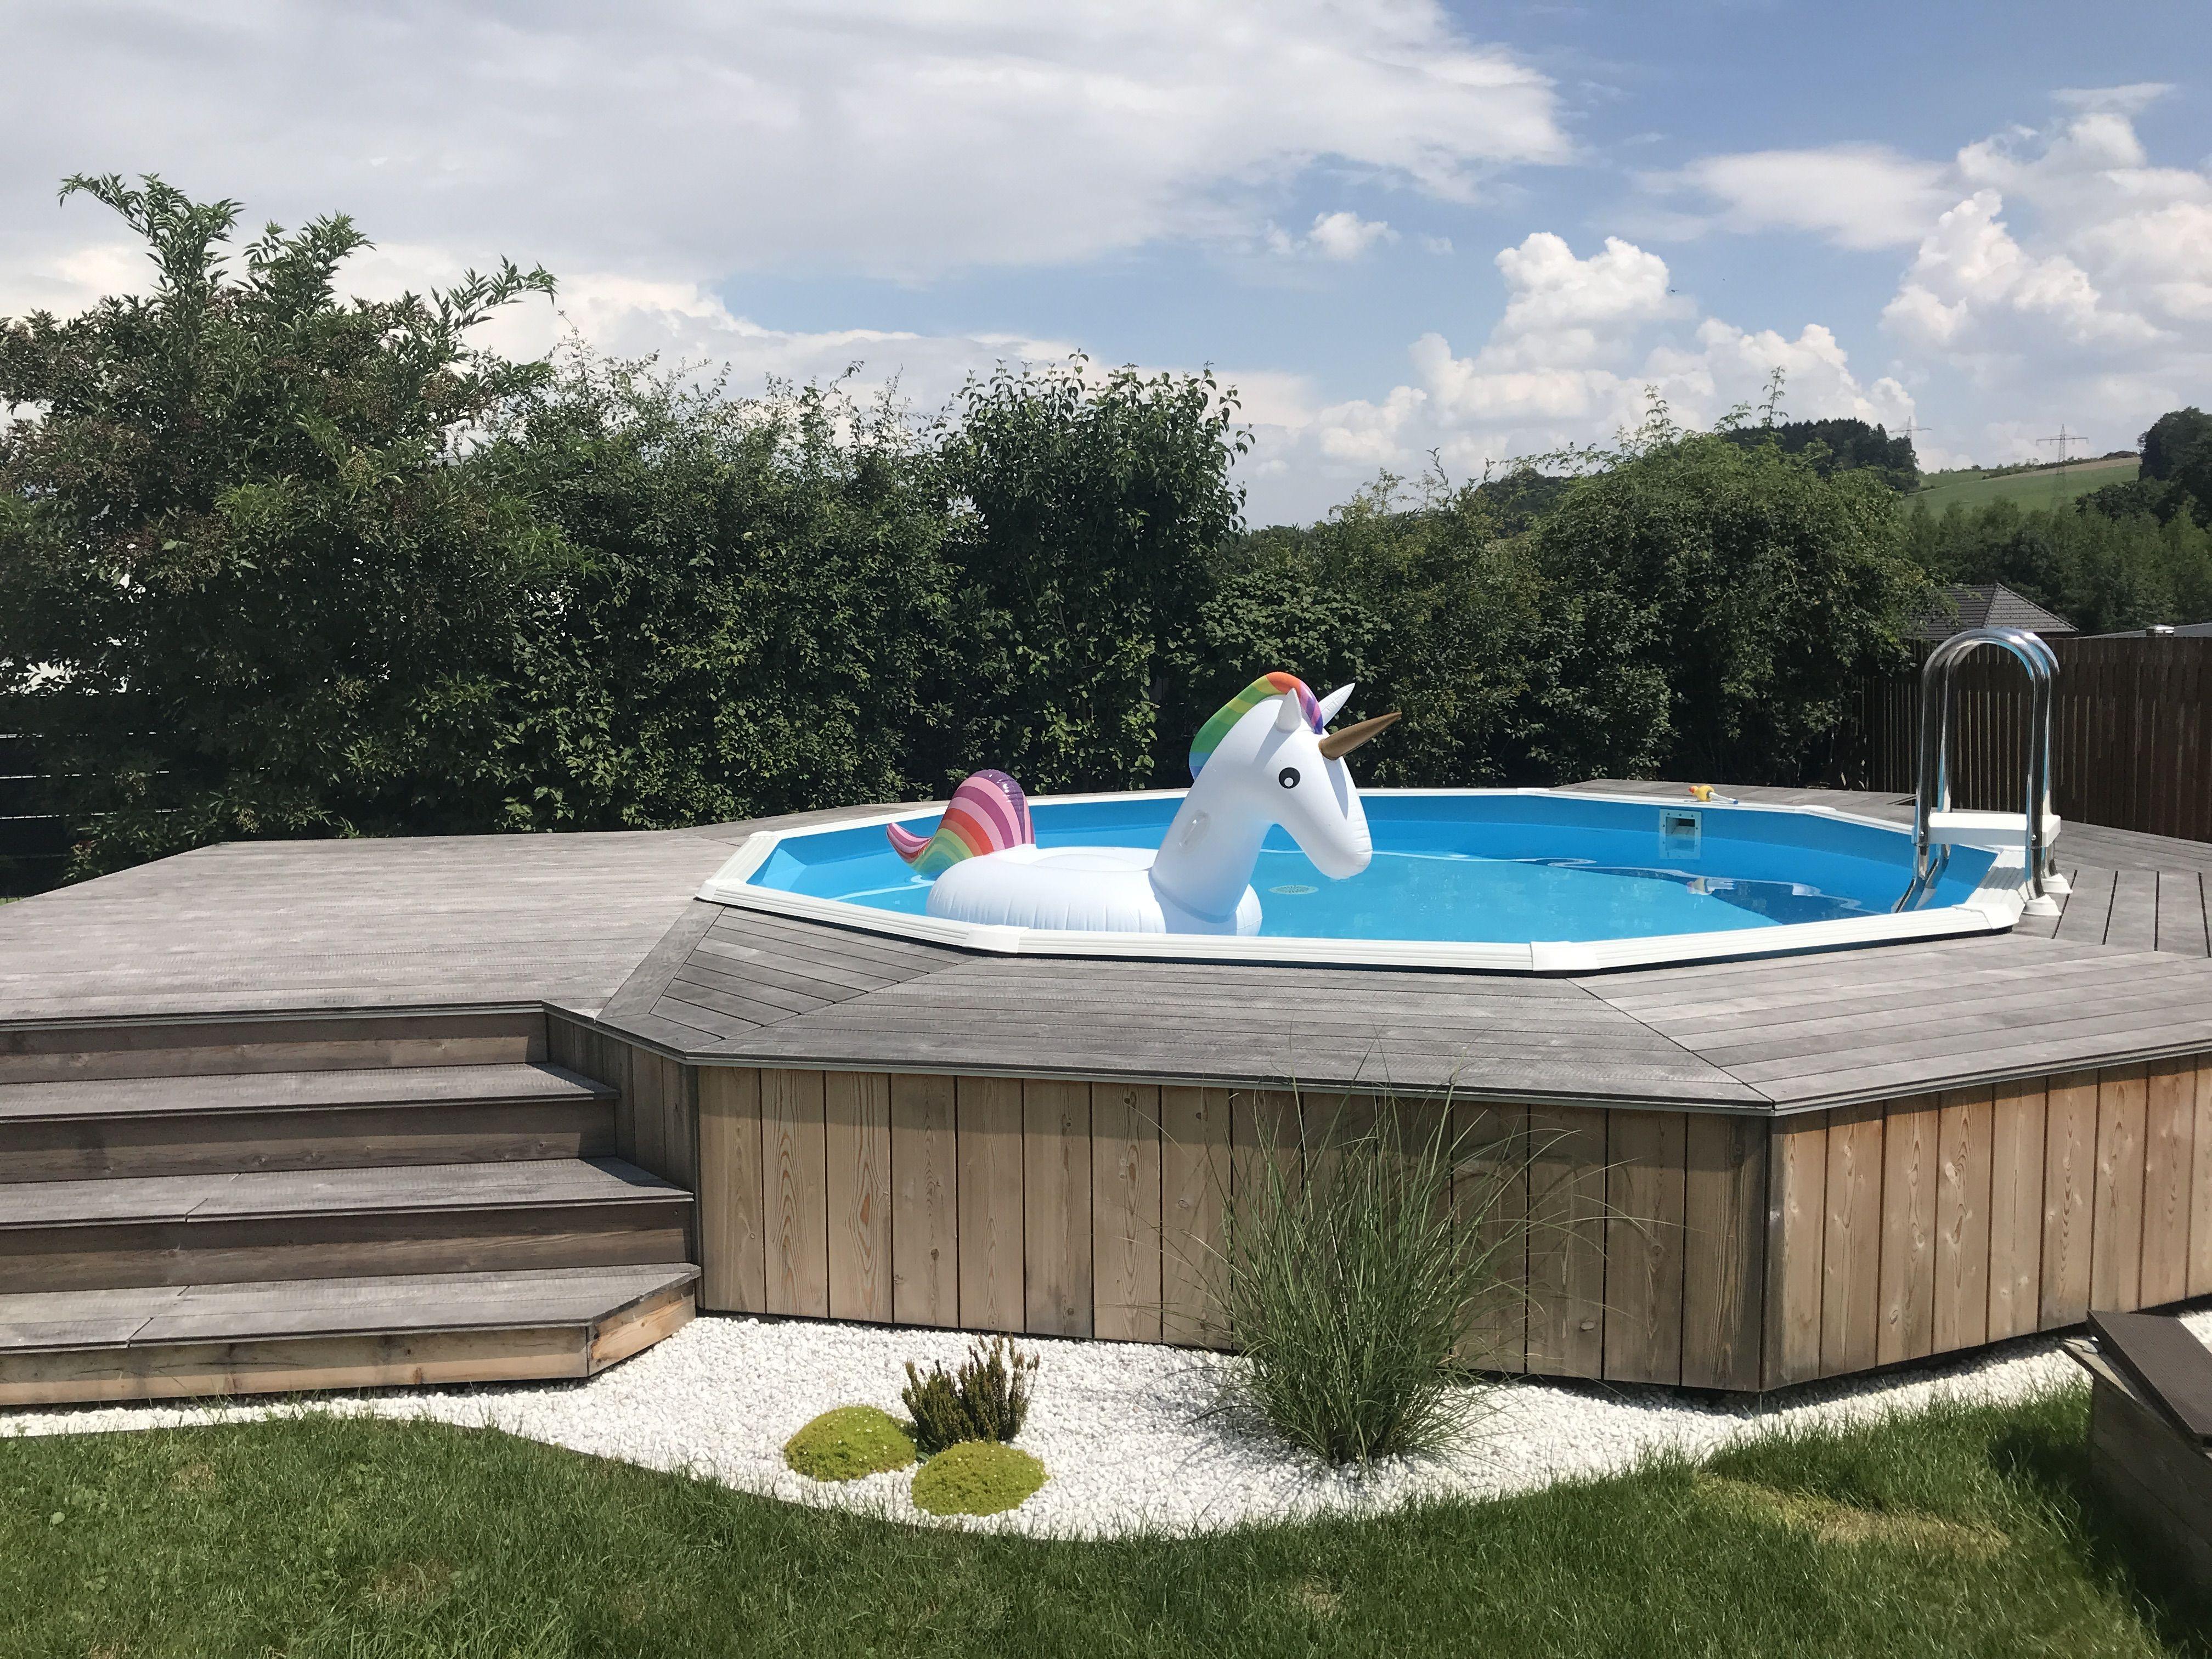 Pool Umrandung Pool Im Garten Hinterhof Pool Landschaftsbau Diy Schwimmbad